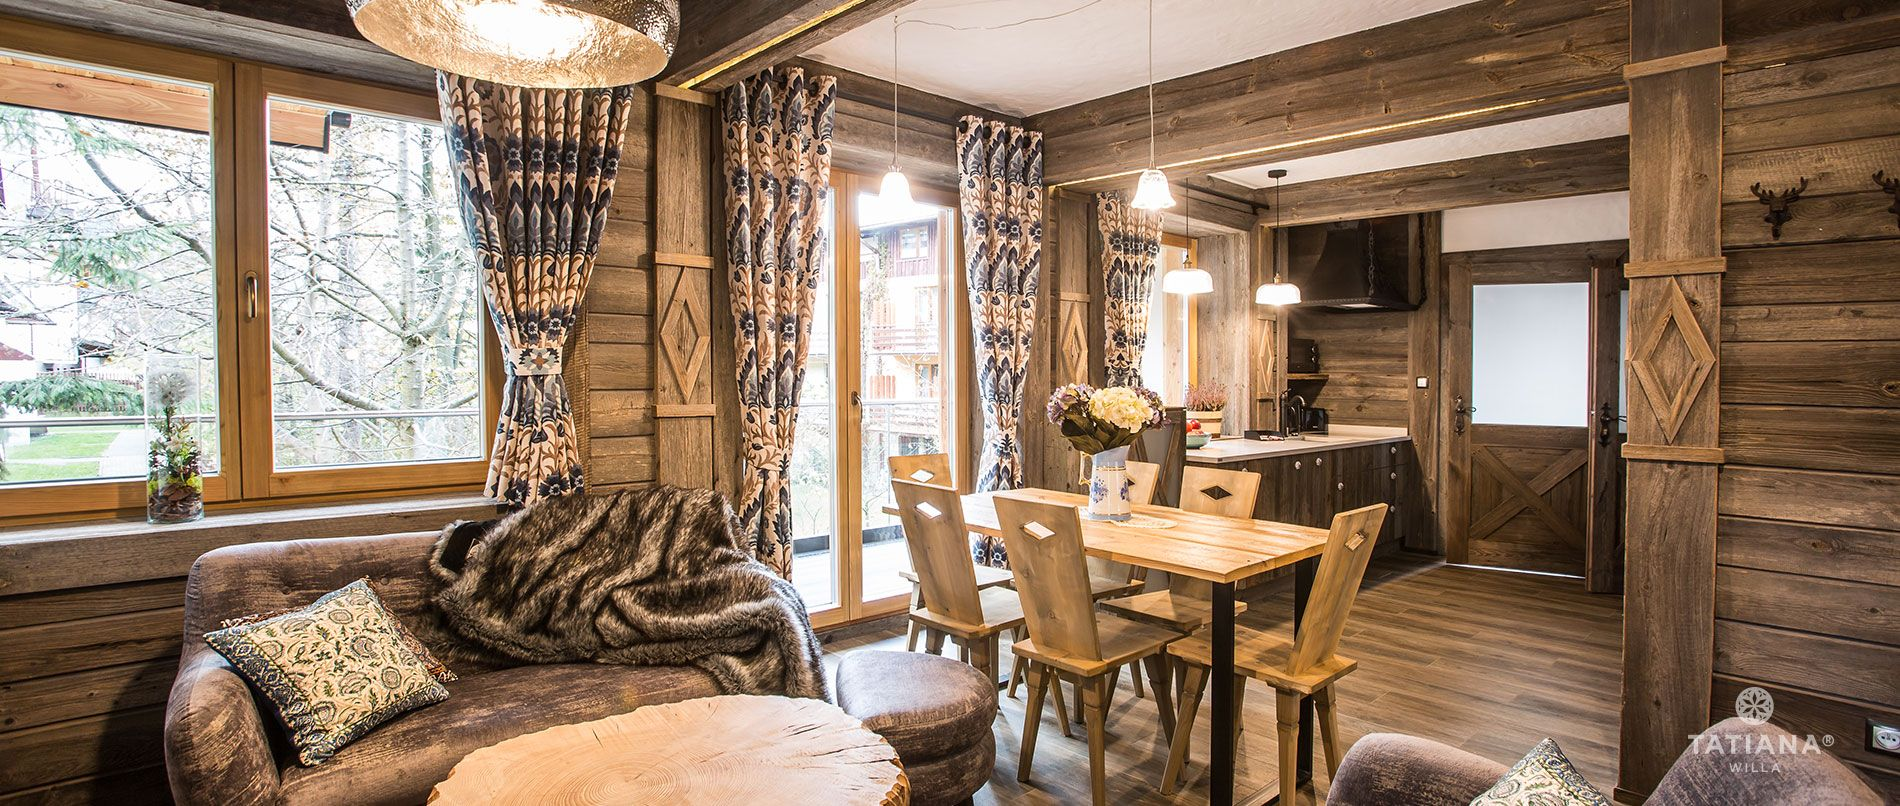 Apartament Syberyjski- salon